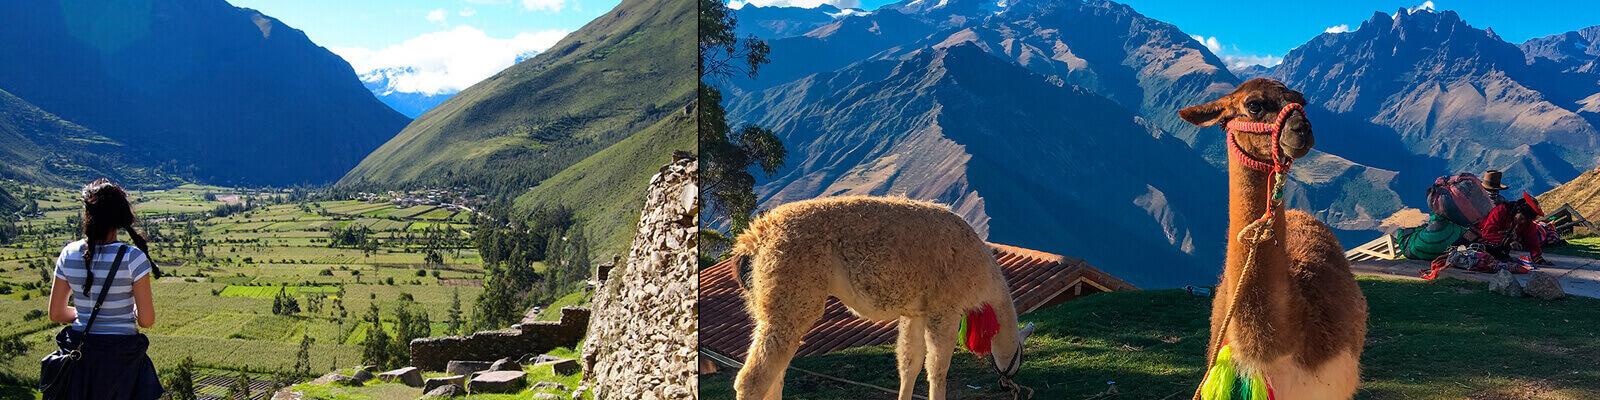 valle-sacrado-de-los-incas-machu-picchu-andes-tours